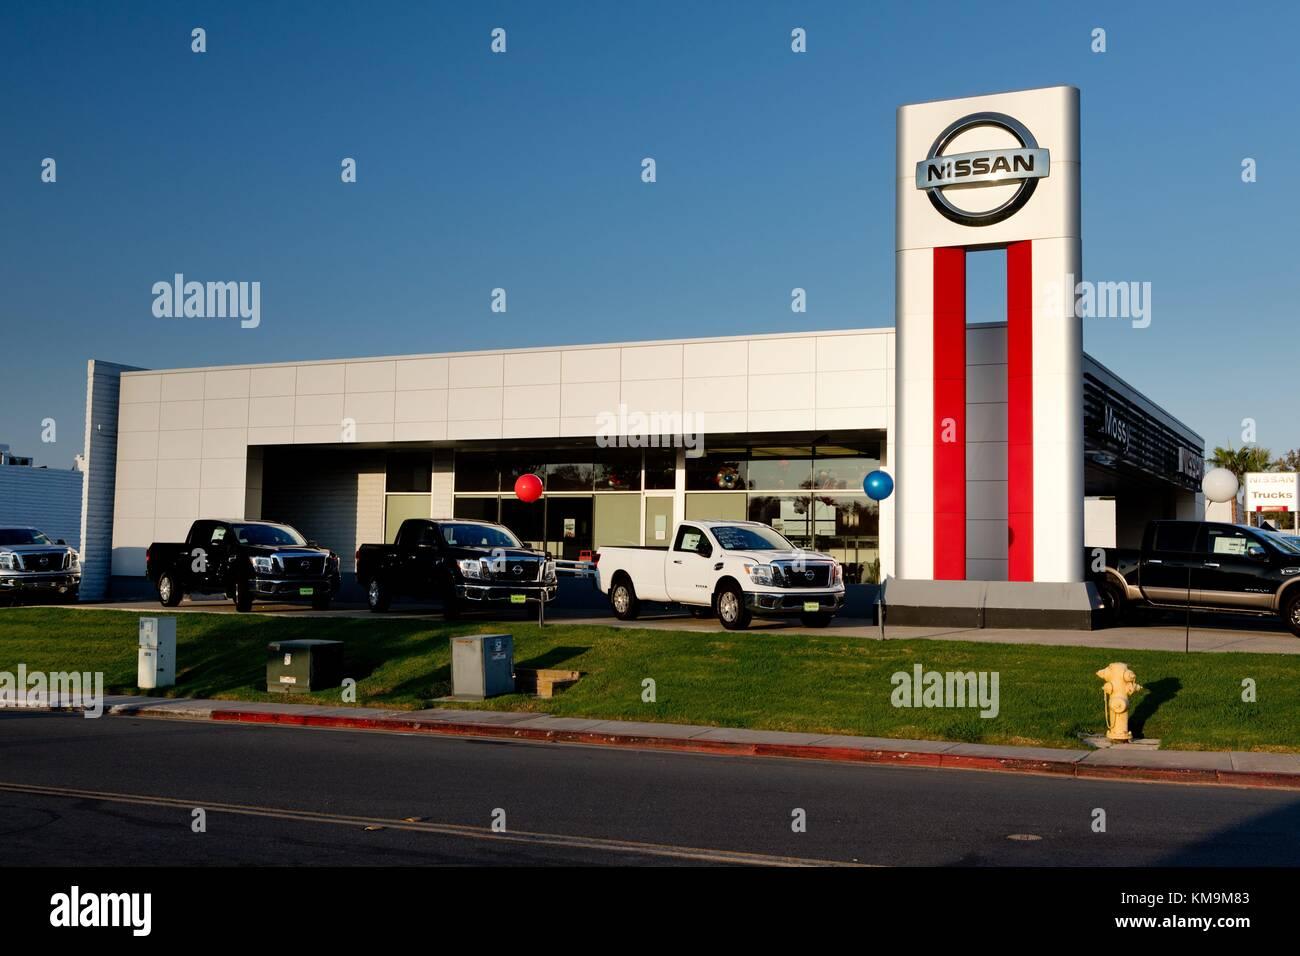 Mossy Nissan Kearny Mesa >> Mossy Nissan Kearny Mesa Car Dealer In San Diego In August